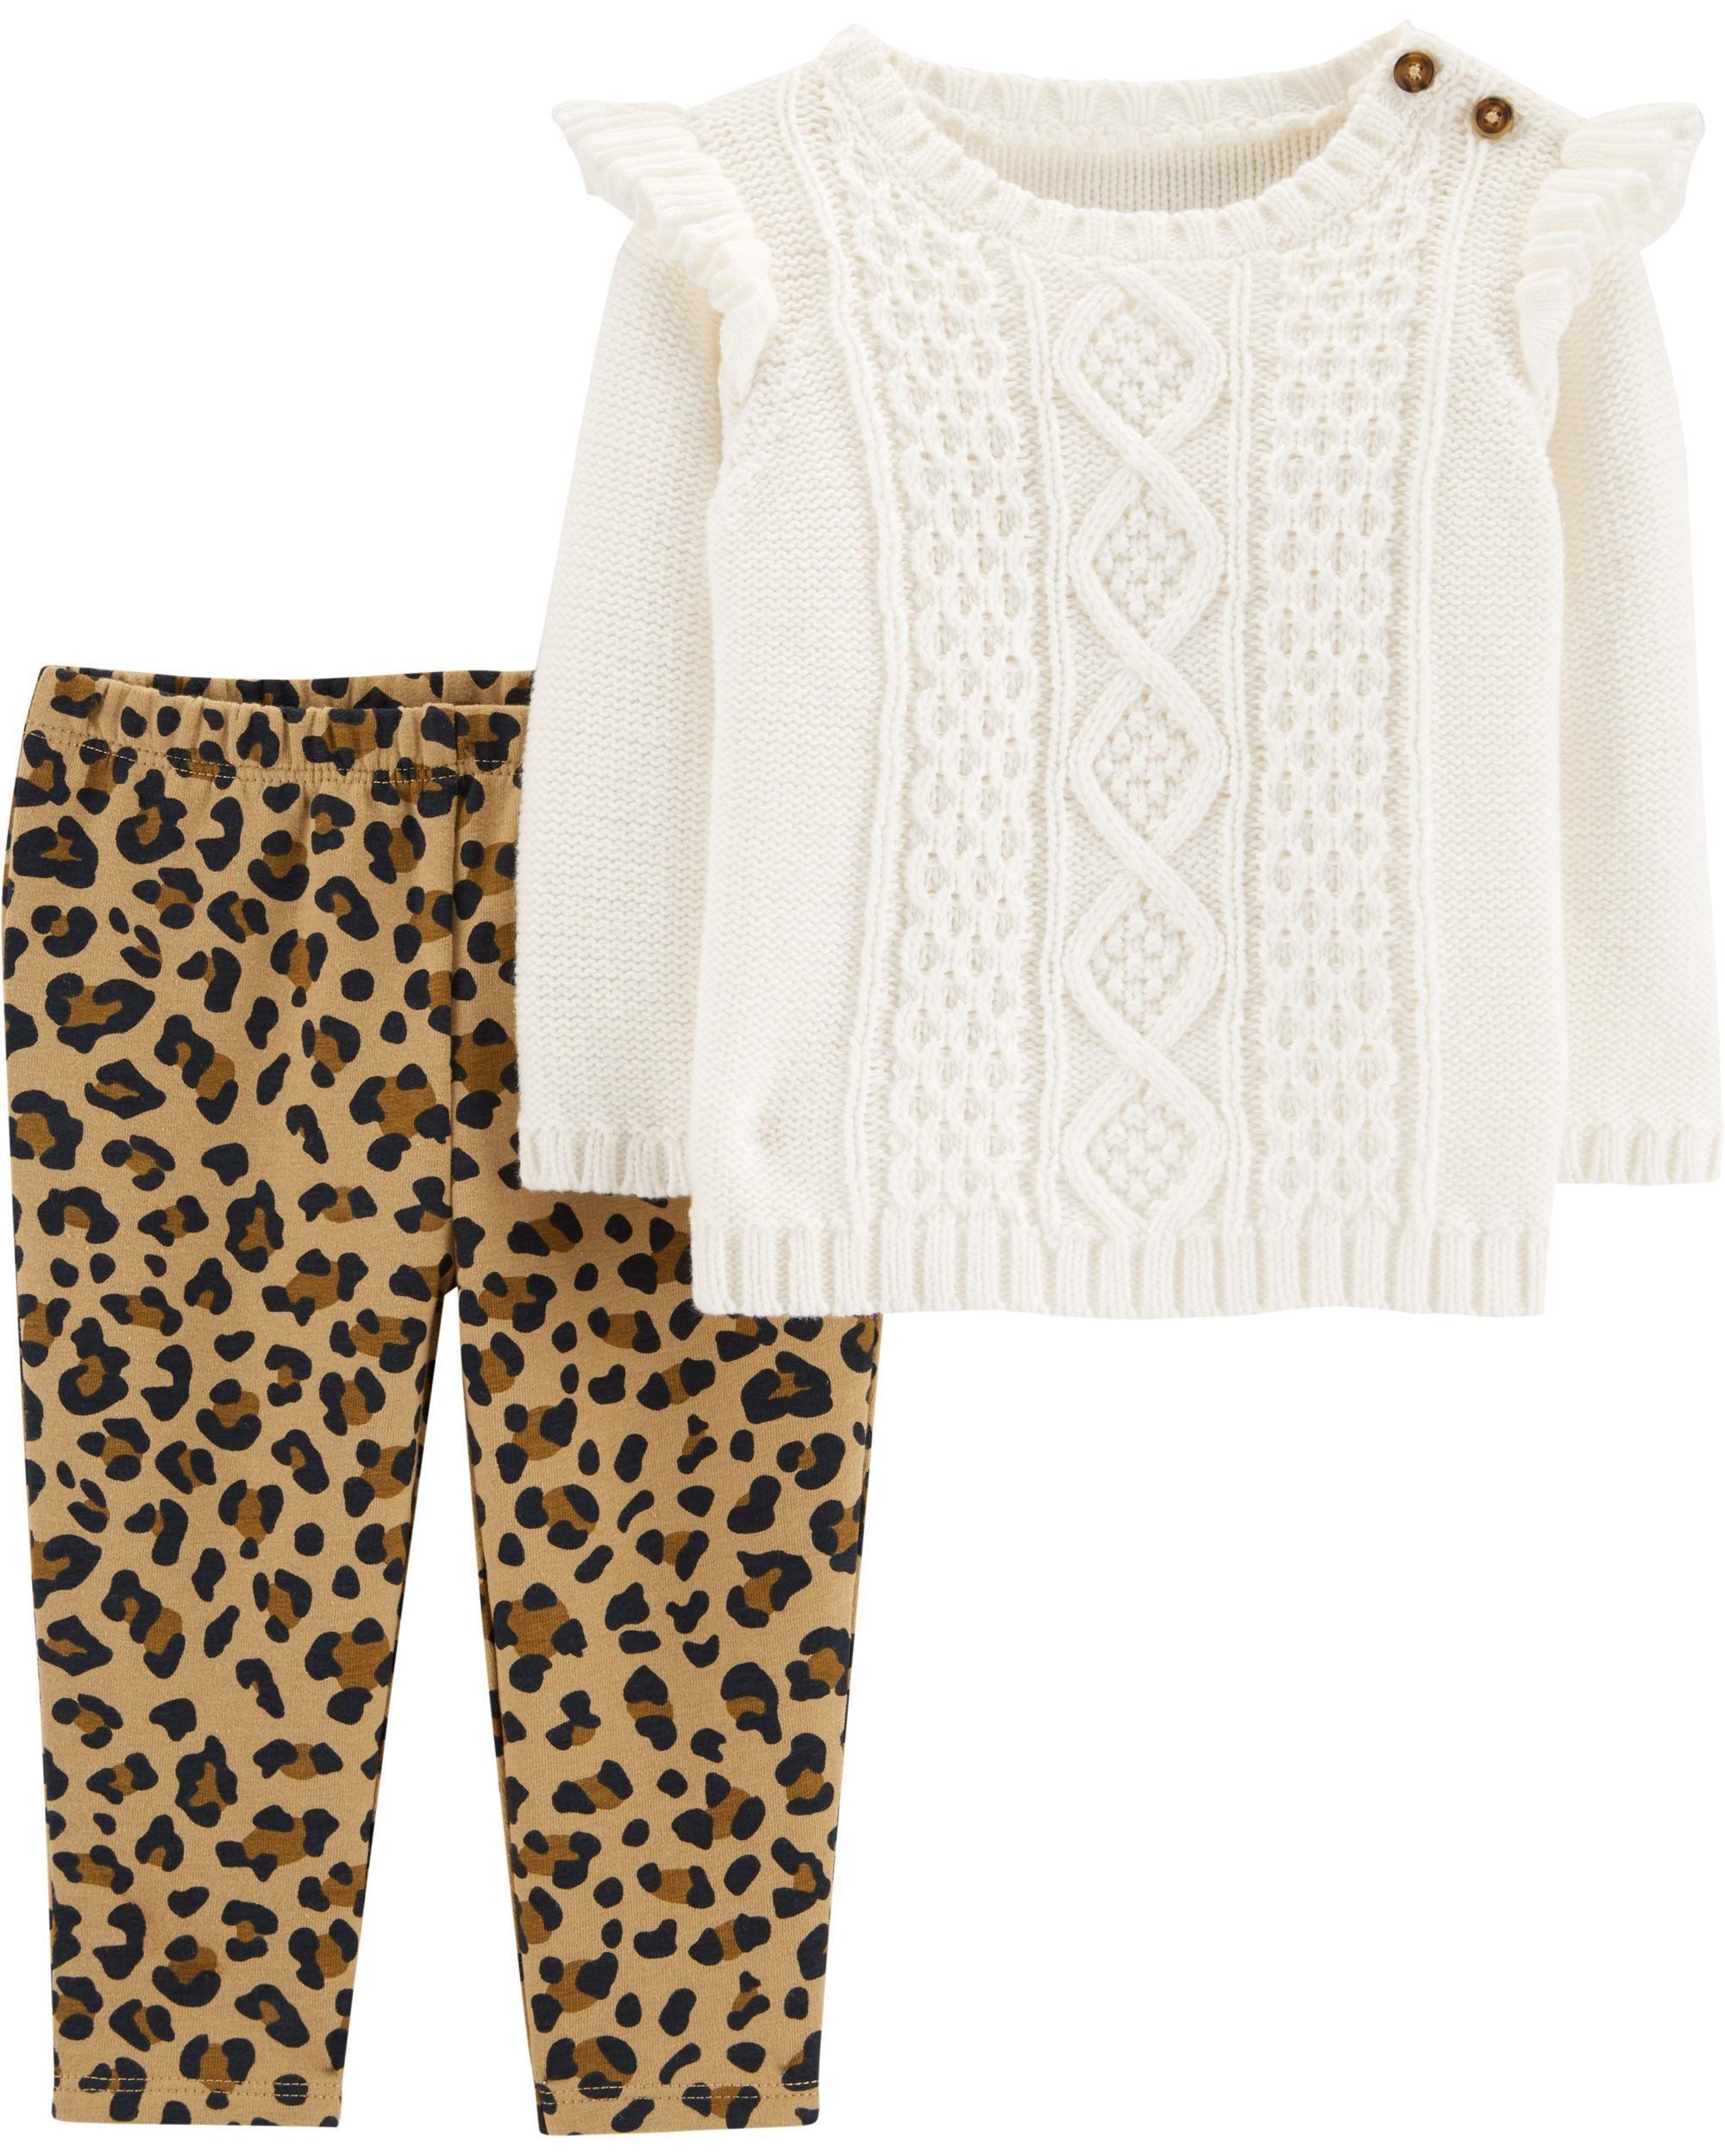 8cfb25b80f 2-Piece Sweater & Leopard Legging Set | gift ideas 2018 | Carters ...